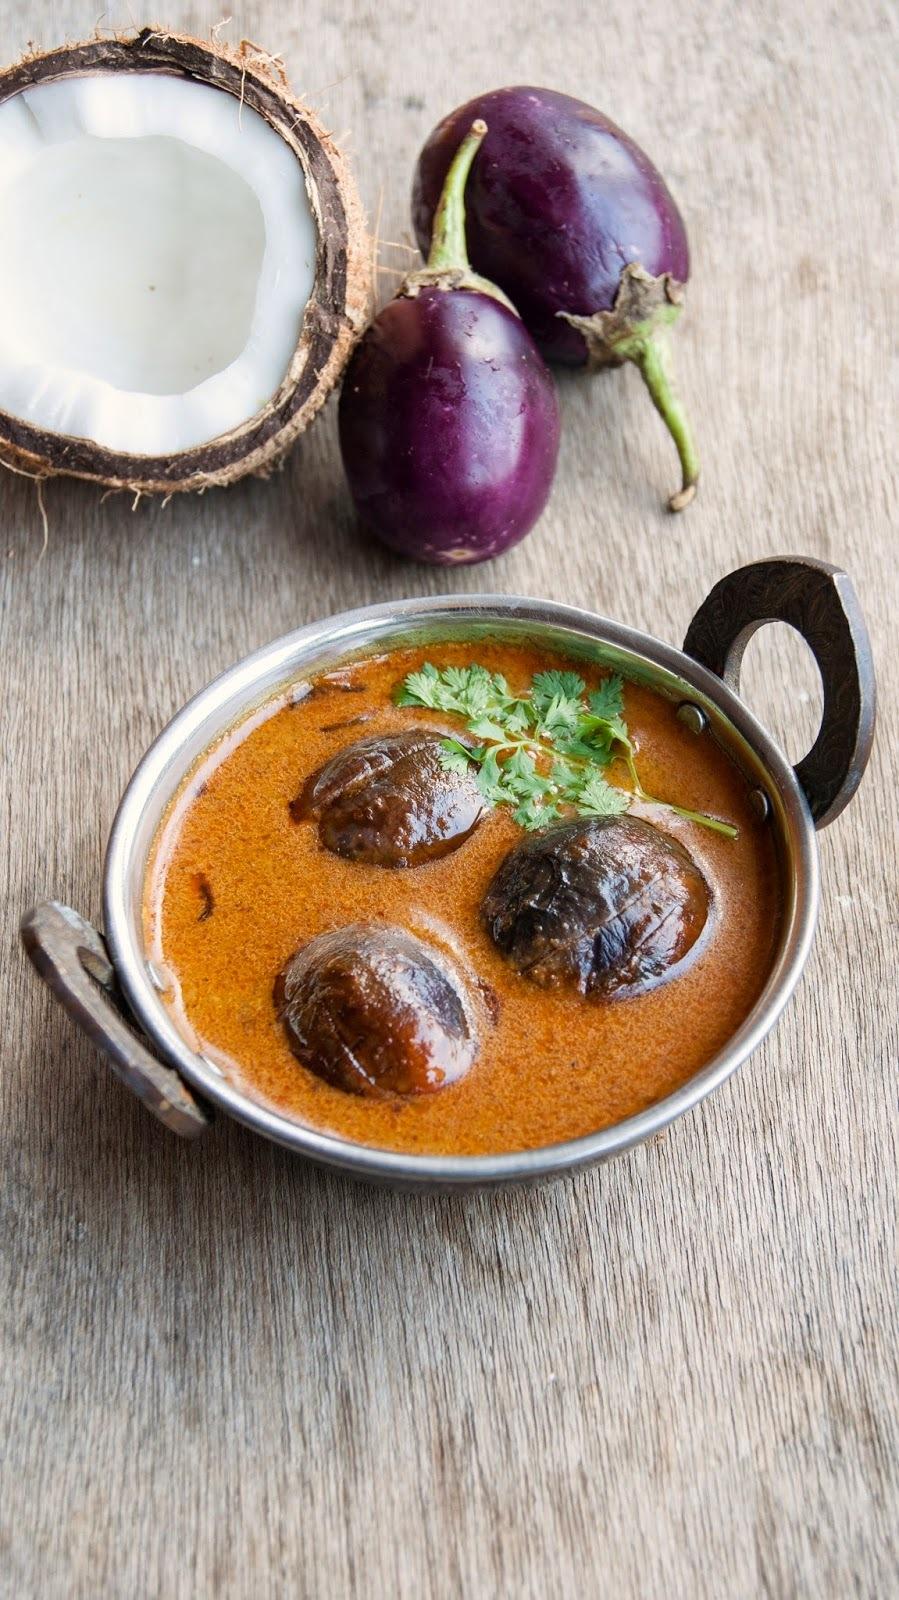 Baingan ka Khatta / Baby Brinjals in tangy sauce